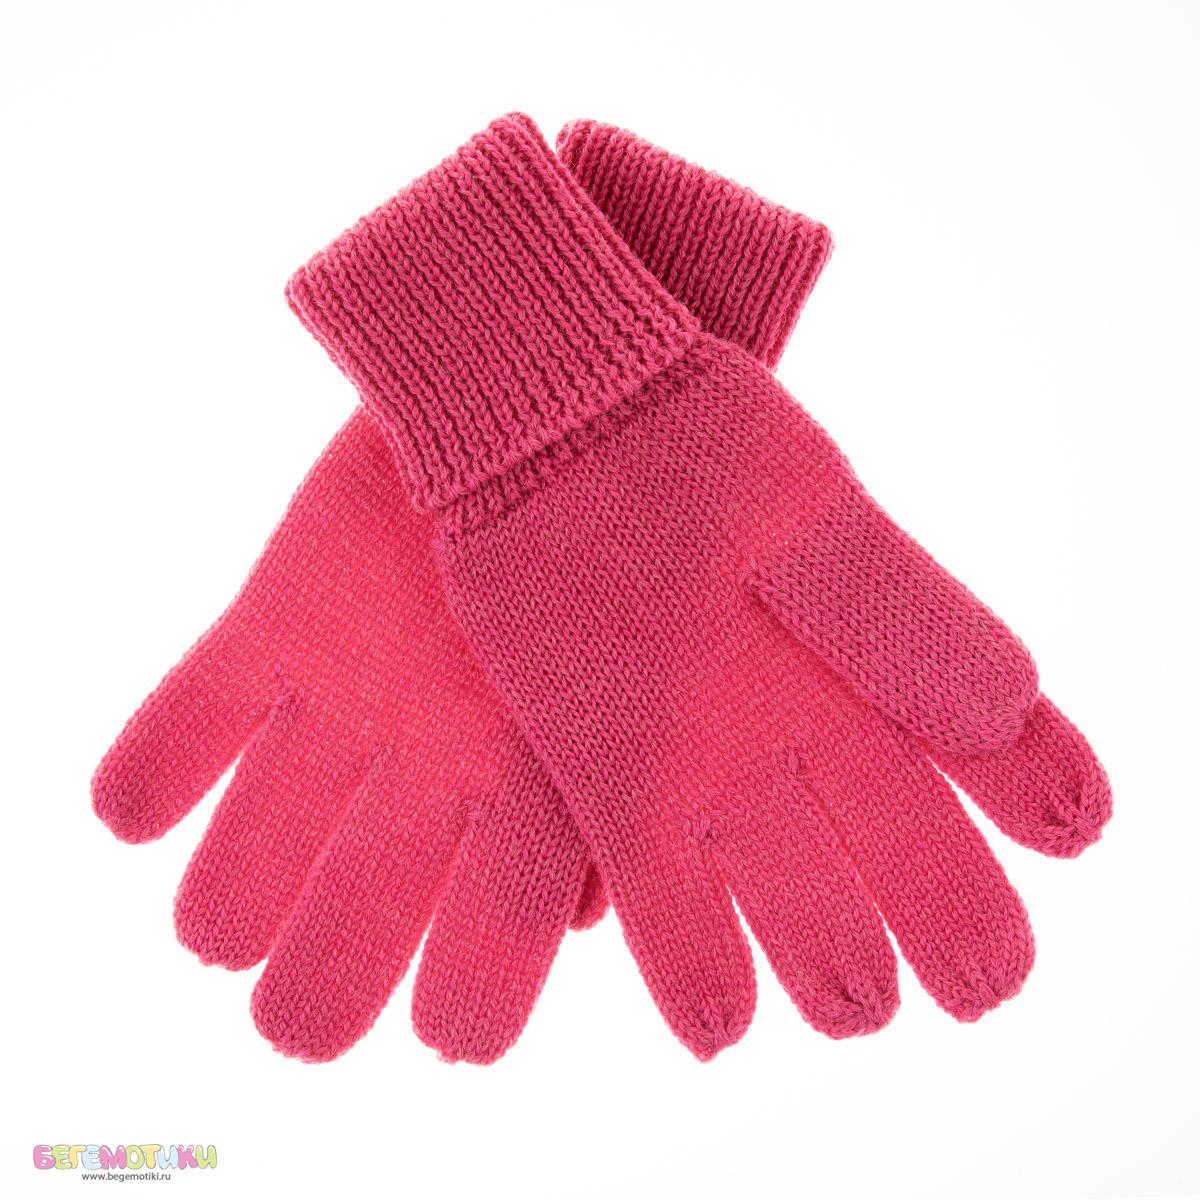 Перчатки KIRA Kerry, Размер 4, Цвет 267-ярко-розовый K19593-267_4